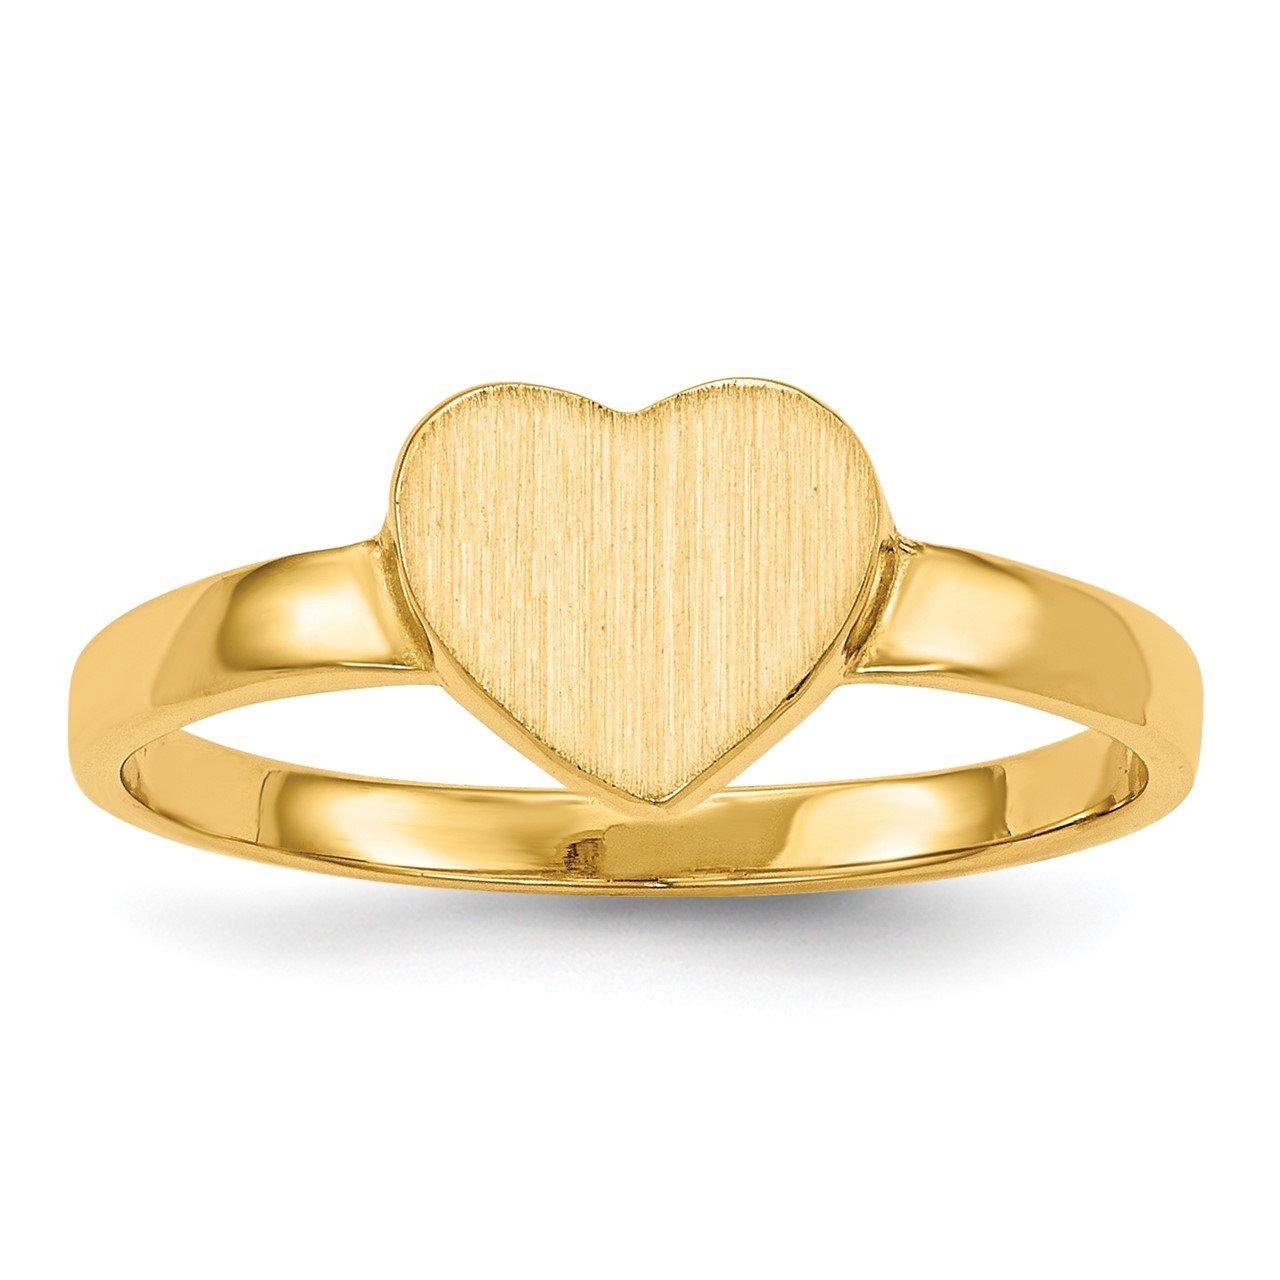 14k 6.5x7.5mm Open Back Heart Signet Ring